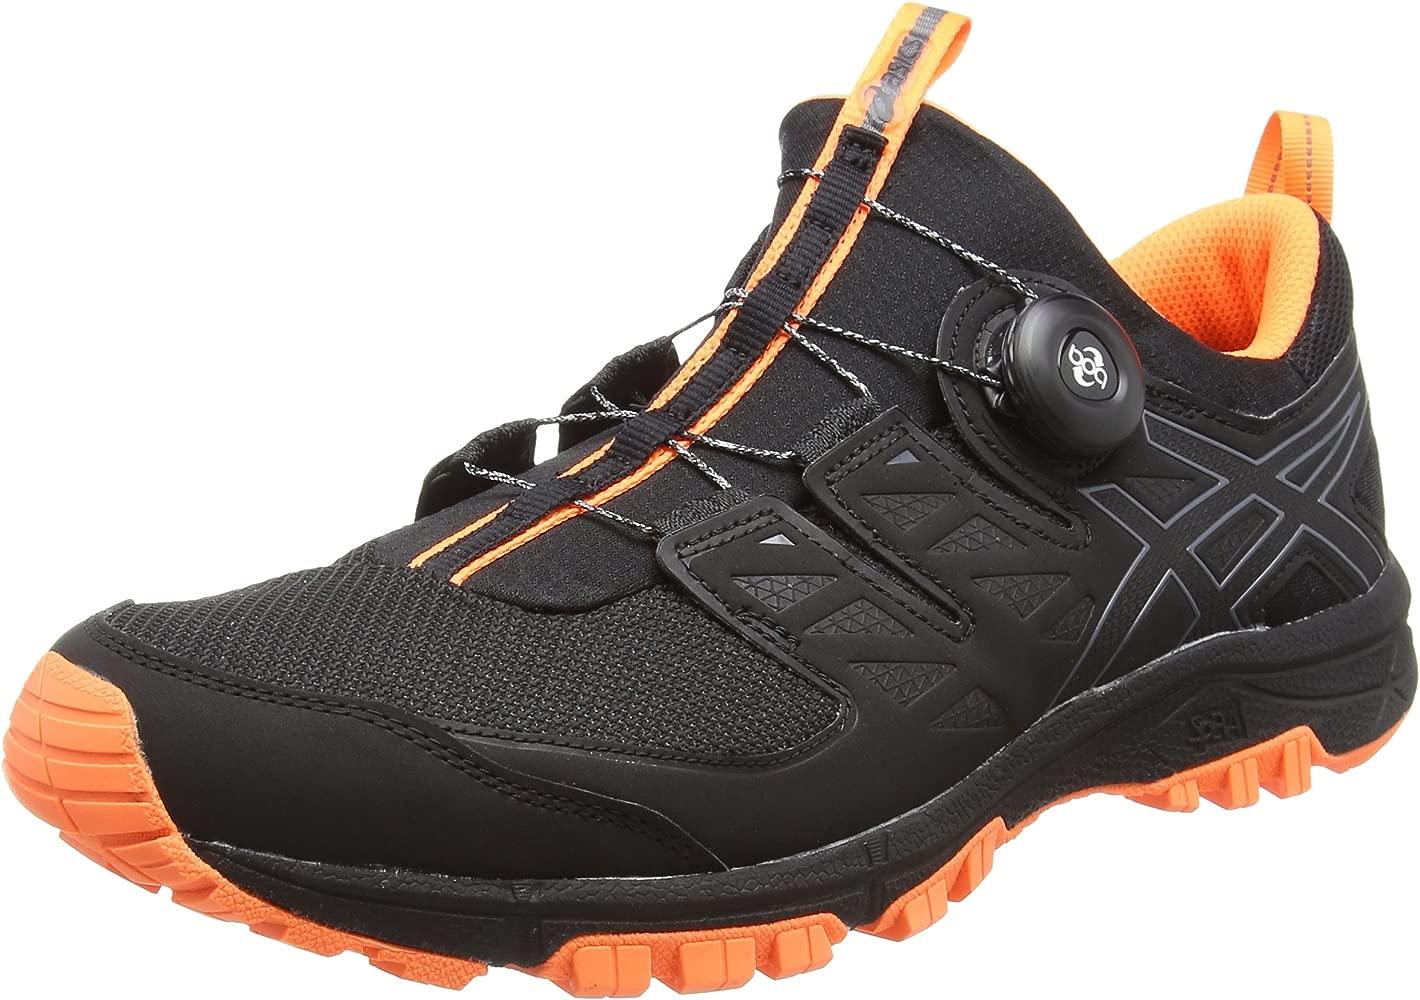 Men's Gel fujirado Training Shoes